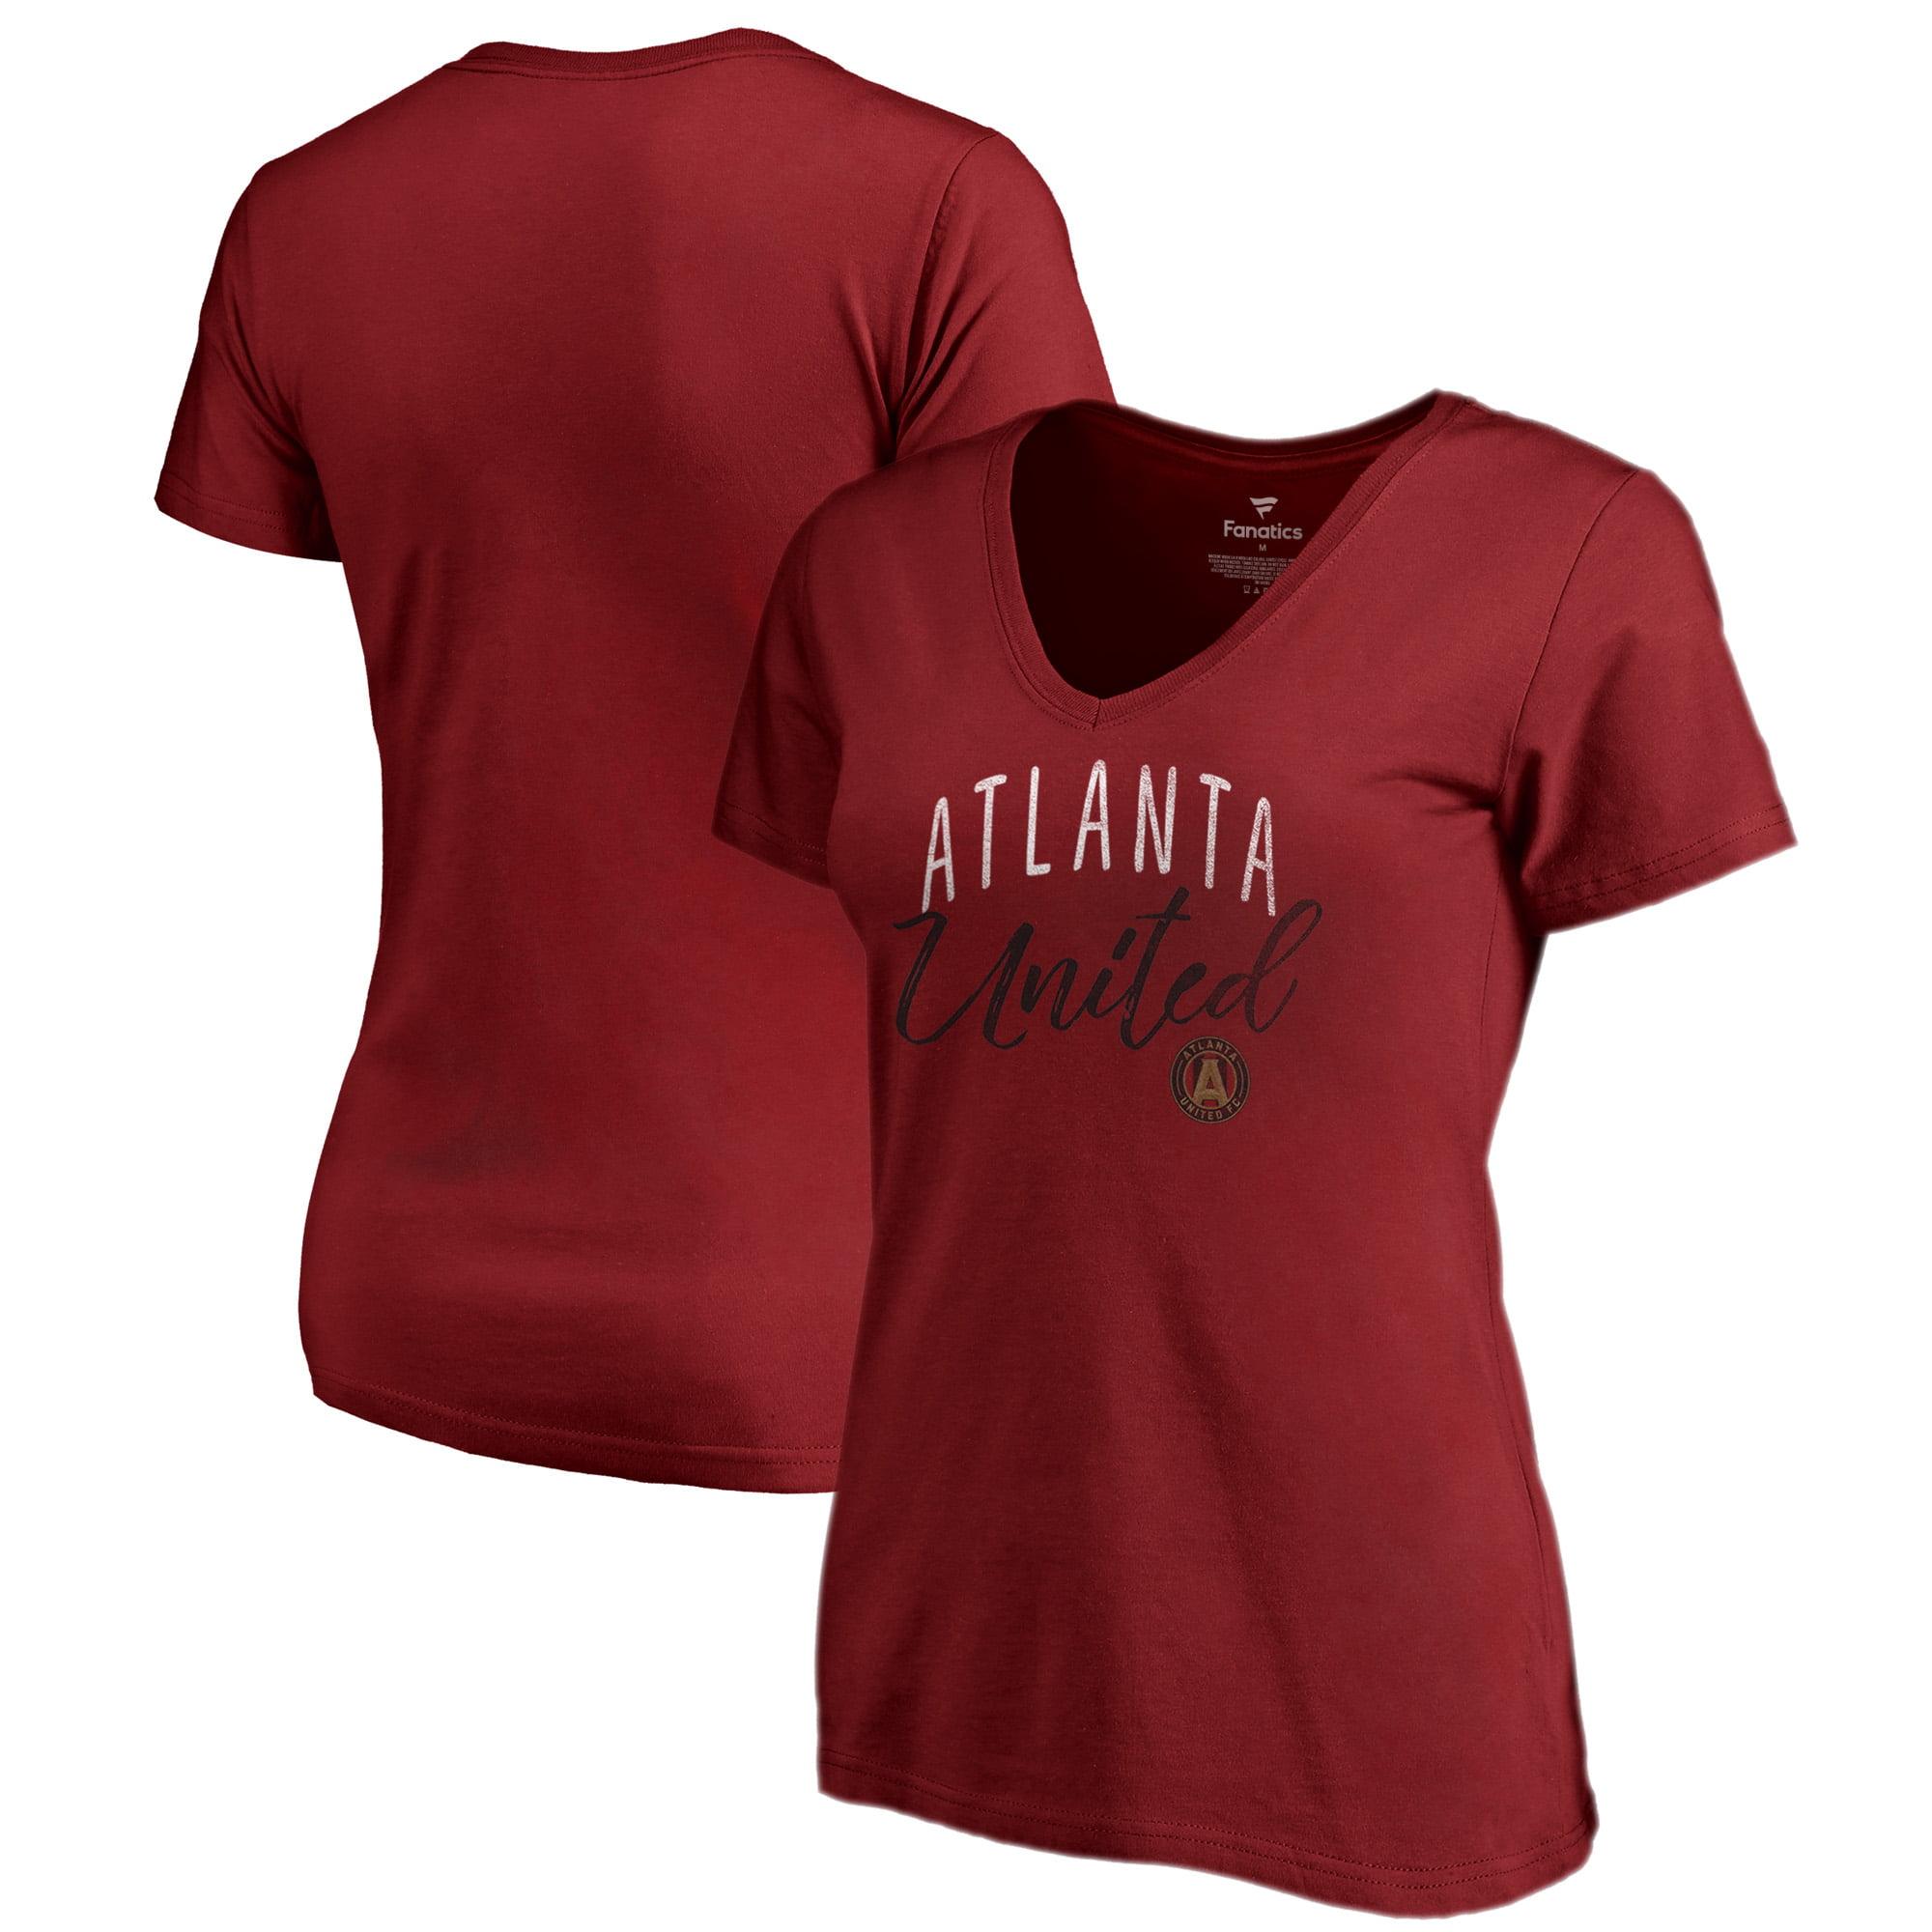 Atlanta United FC Fanatics Branded Women's Graceful V-Neck T-Shirt - Red